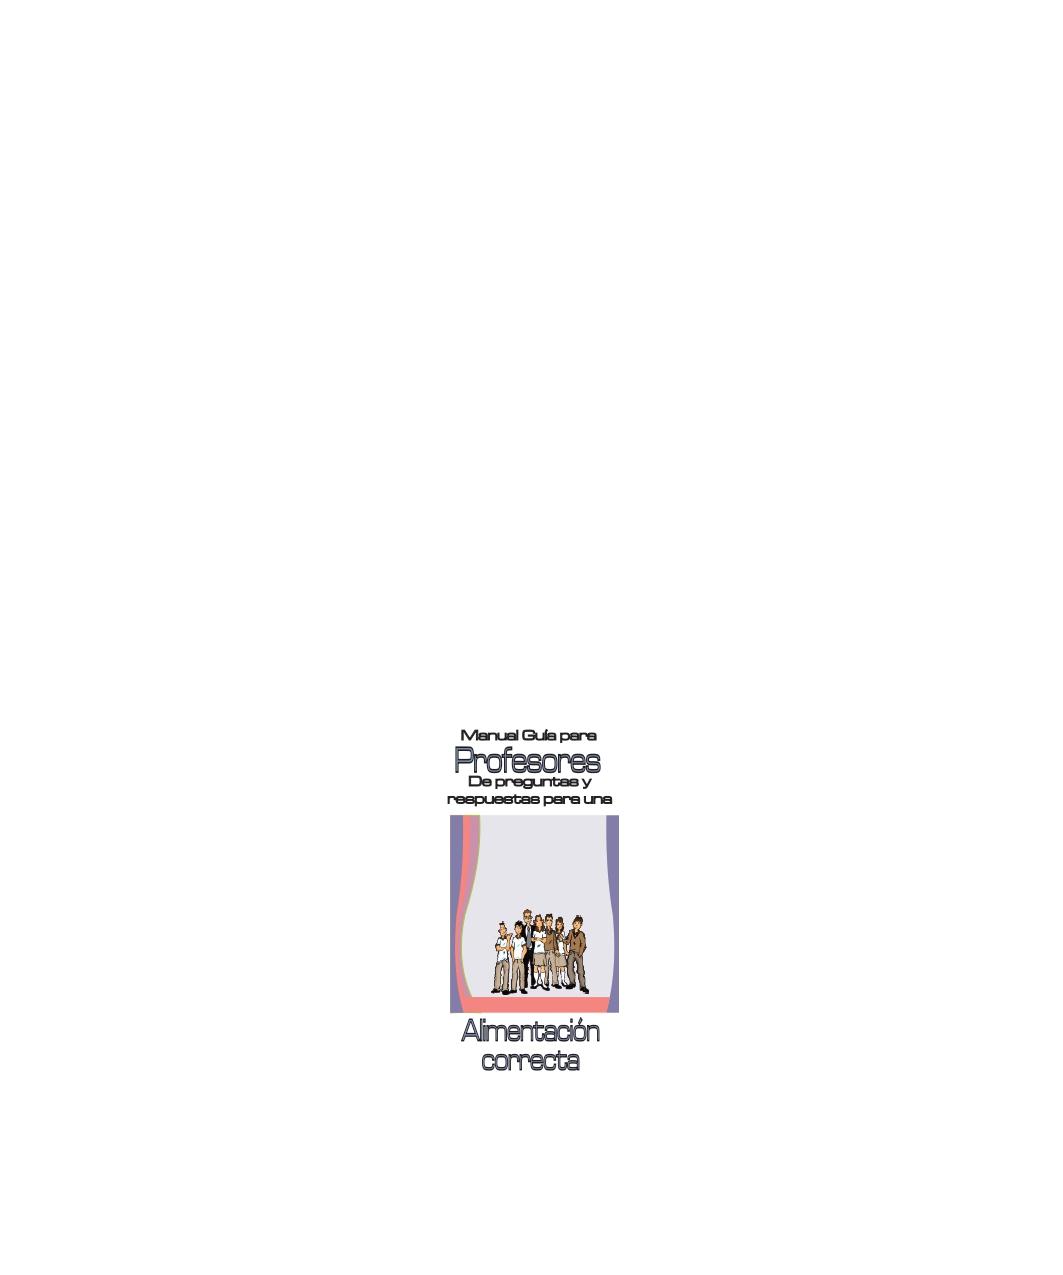 Manual profesores digital_page-0029